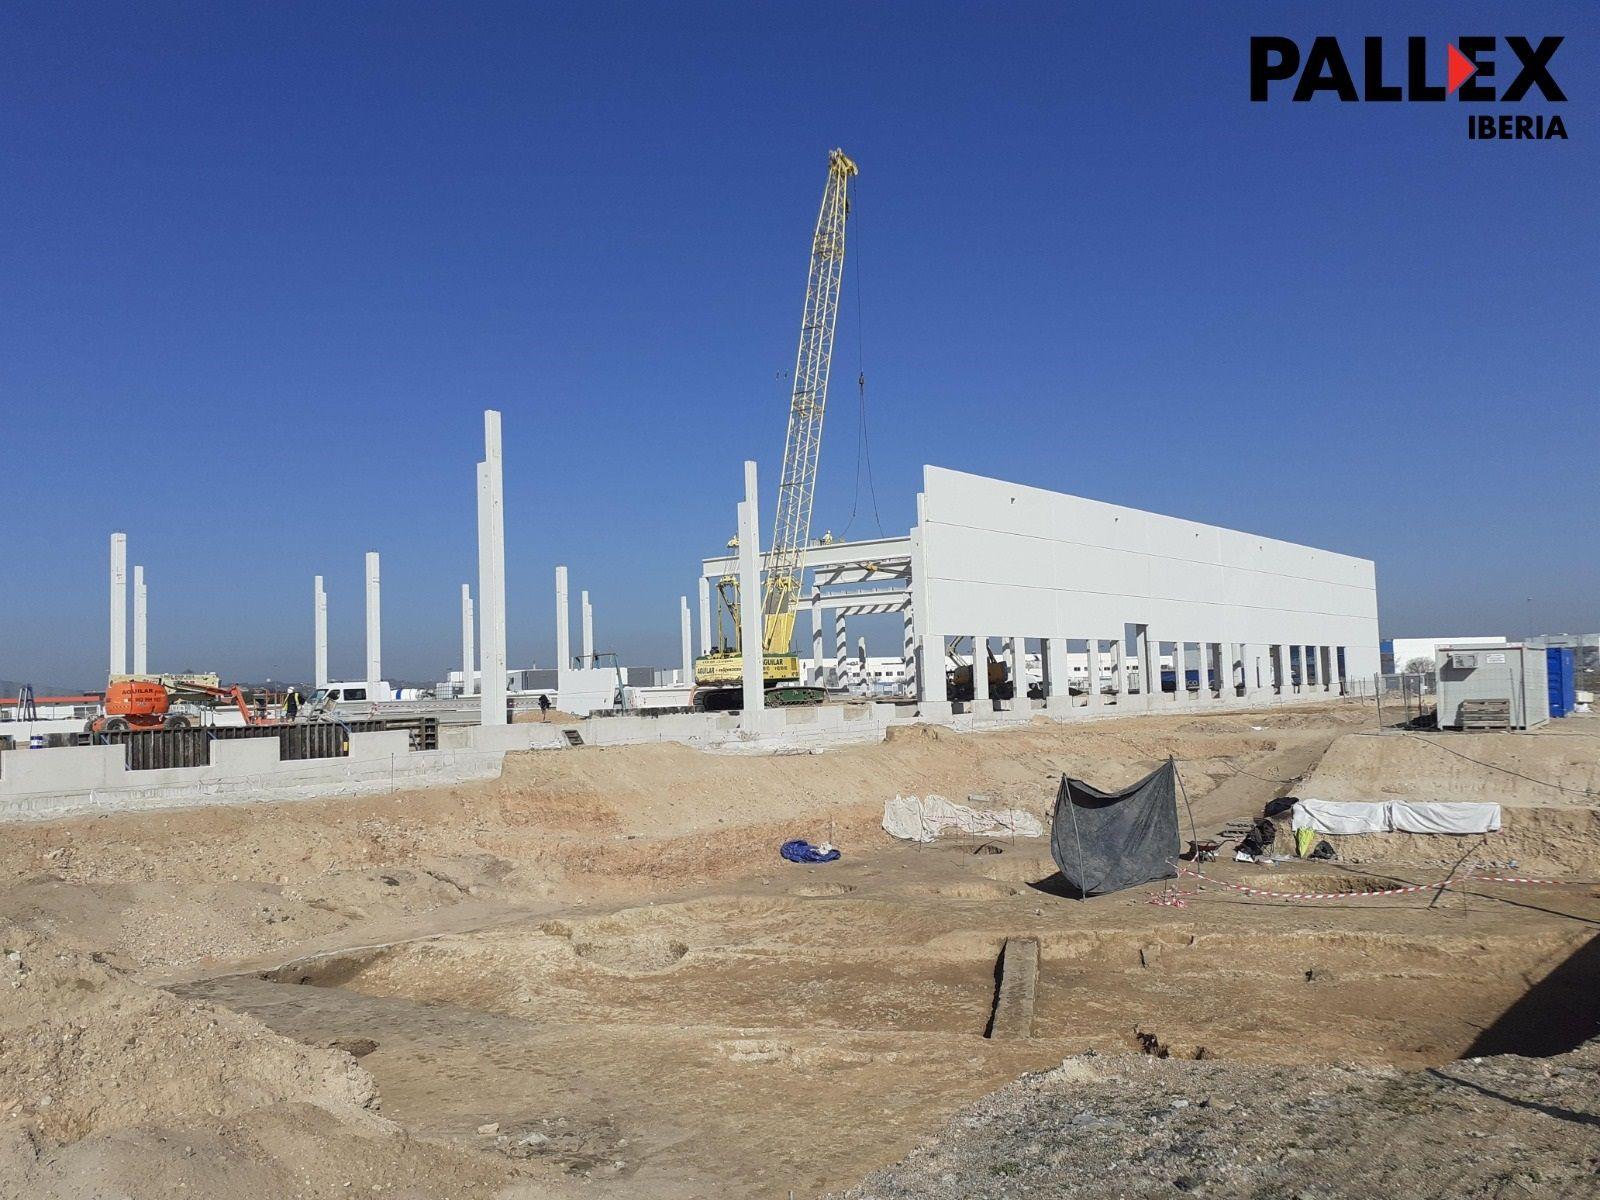 Pall-Ex Iberia